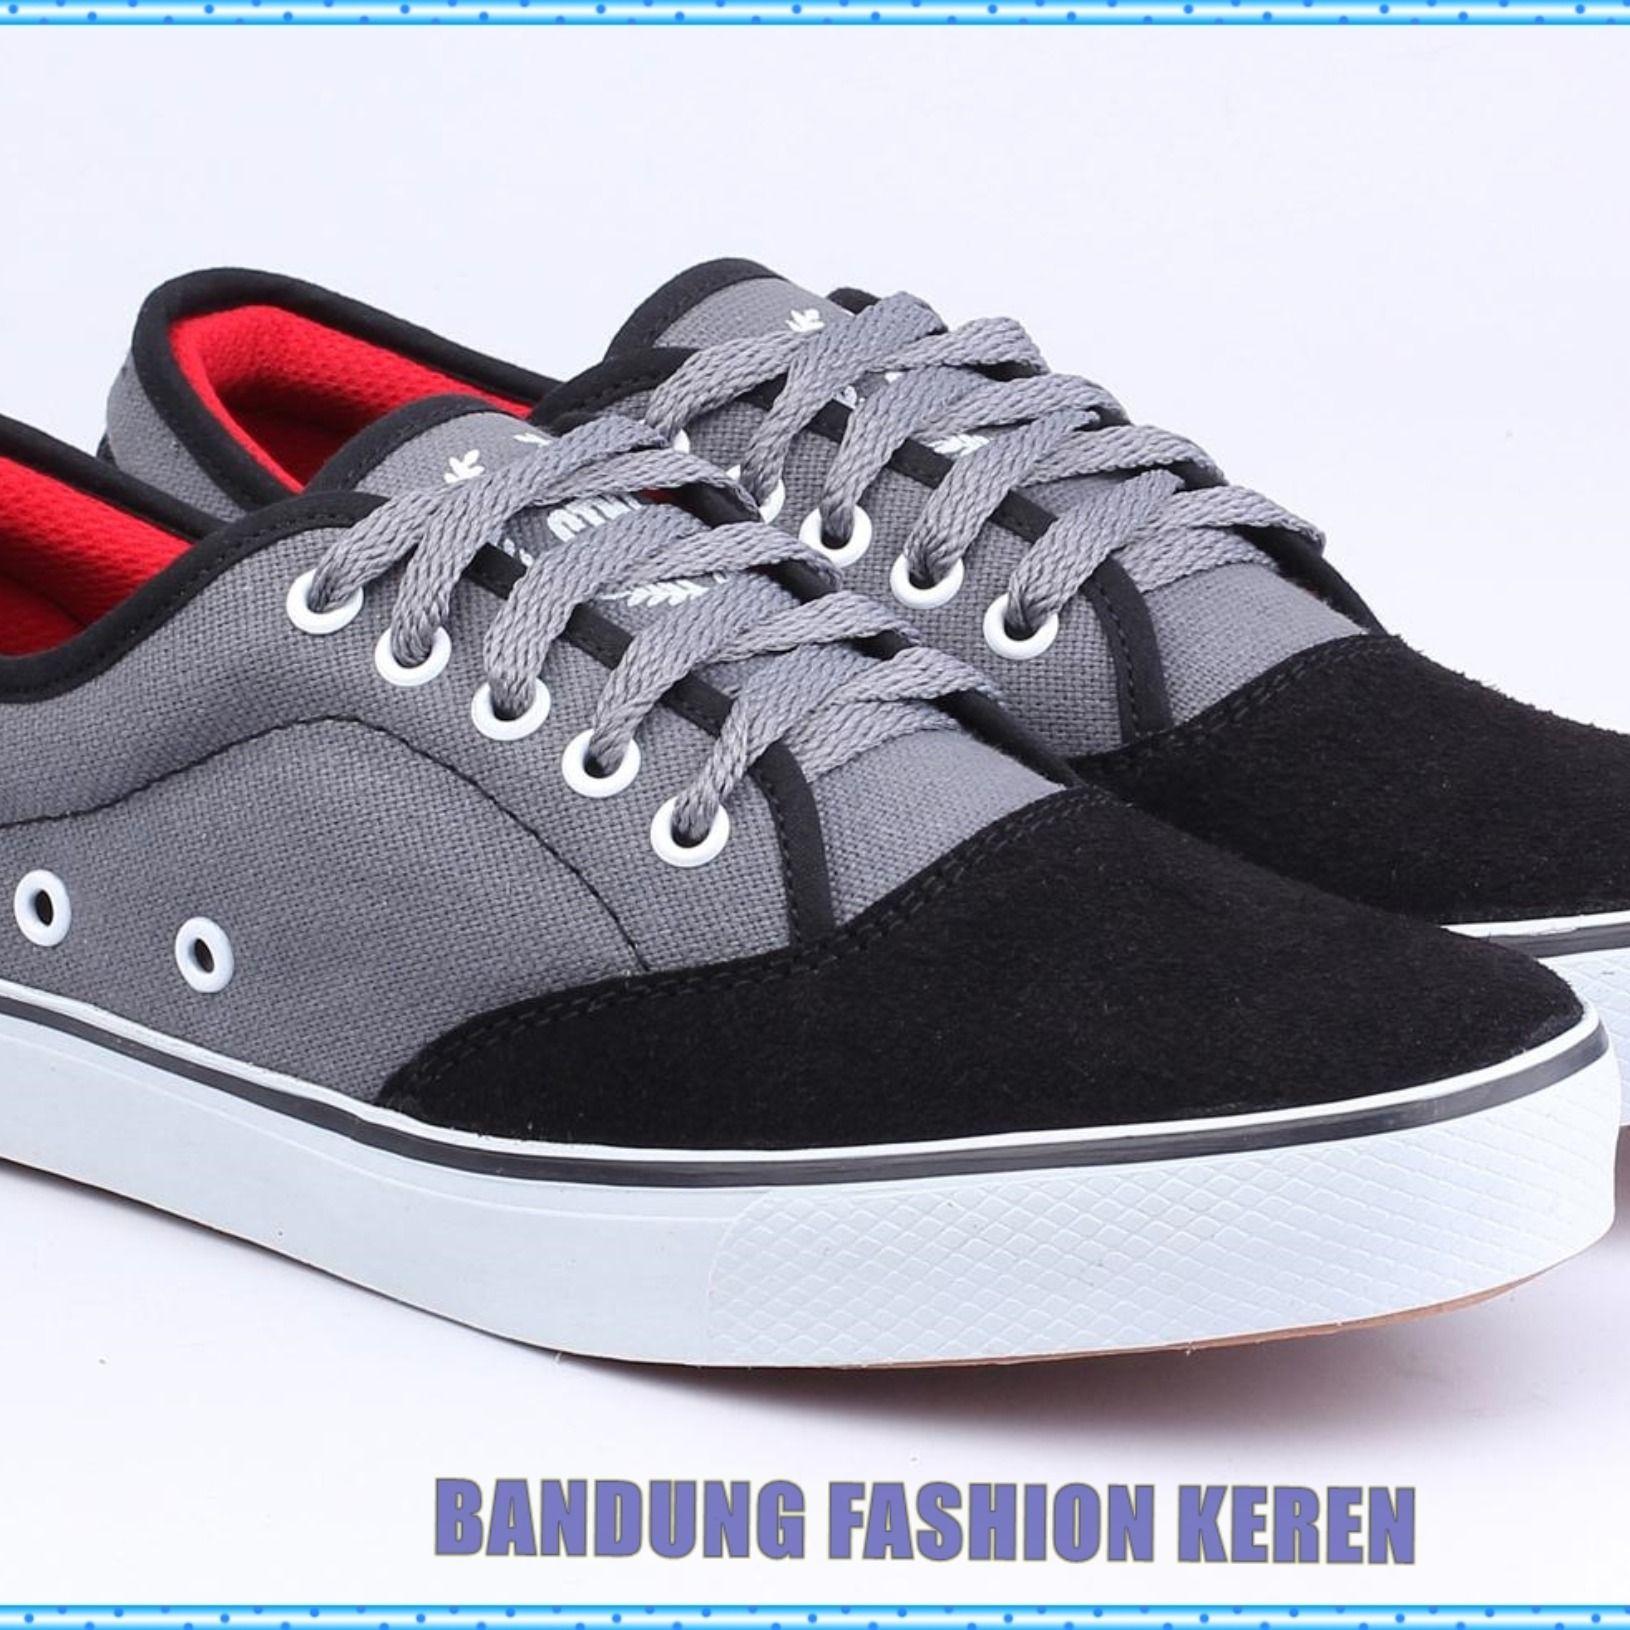 Sepatu Casual Pria Ba 5011 Produk Fashion Handmade Terbaik 100